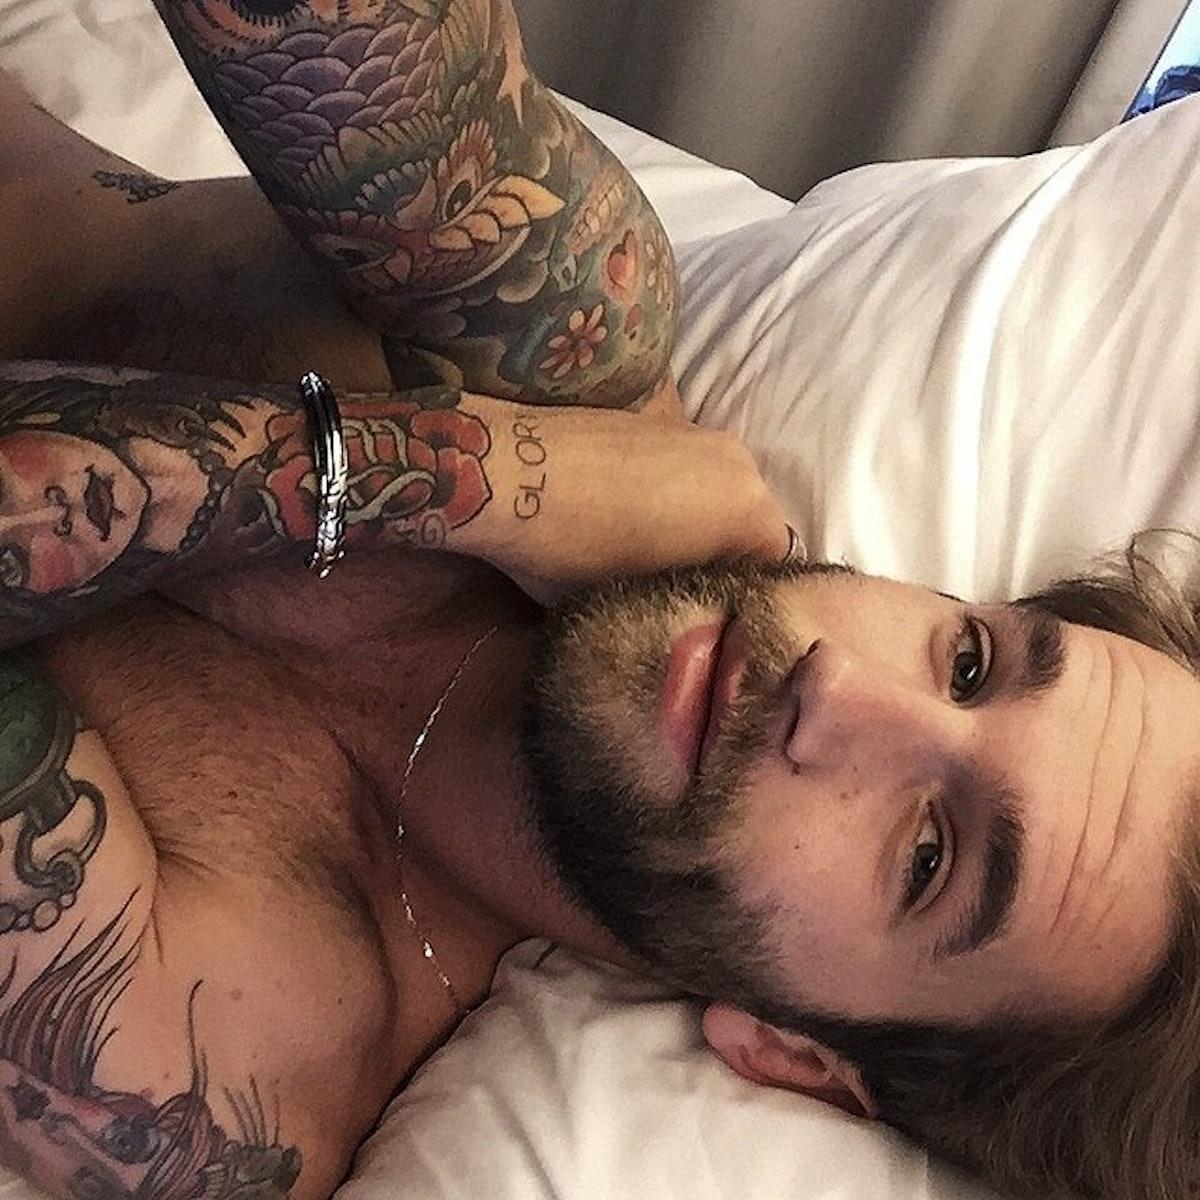 Guy selfie hot Guys, Follow